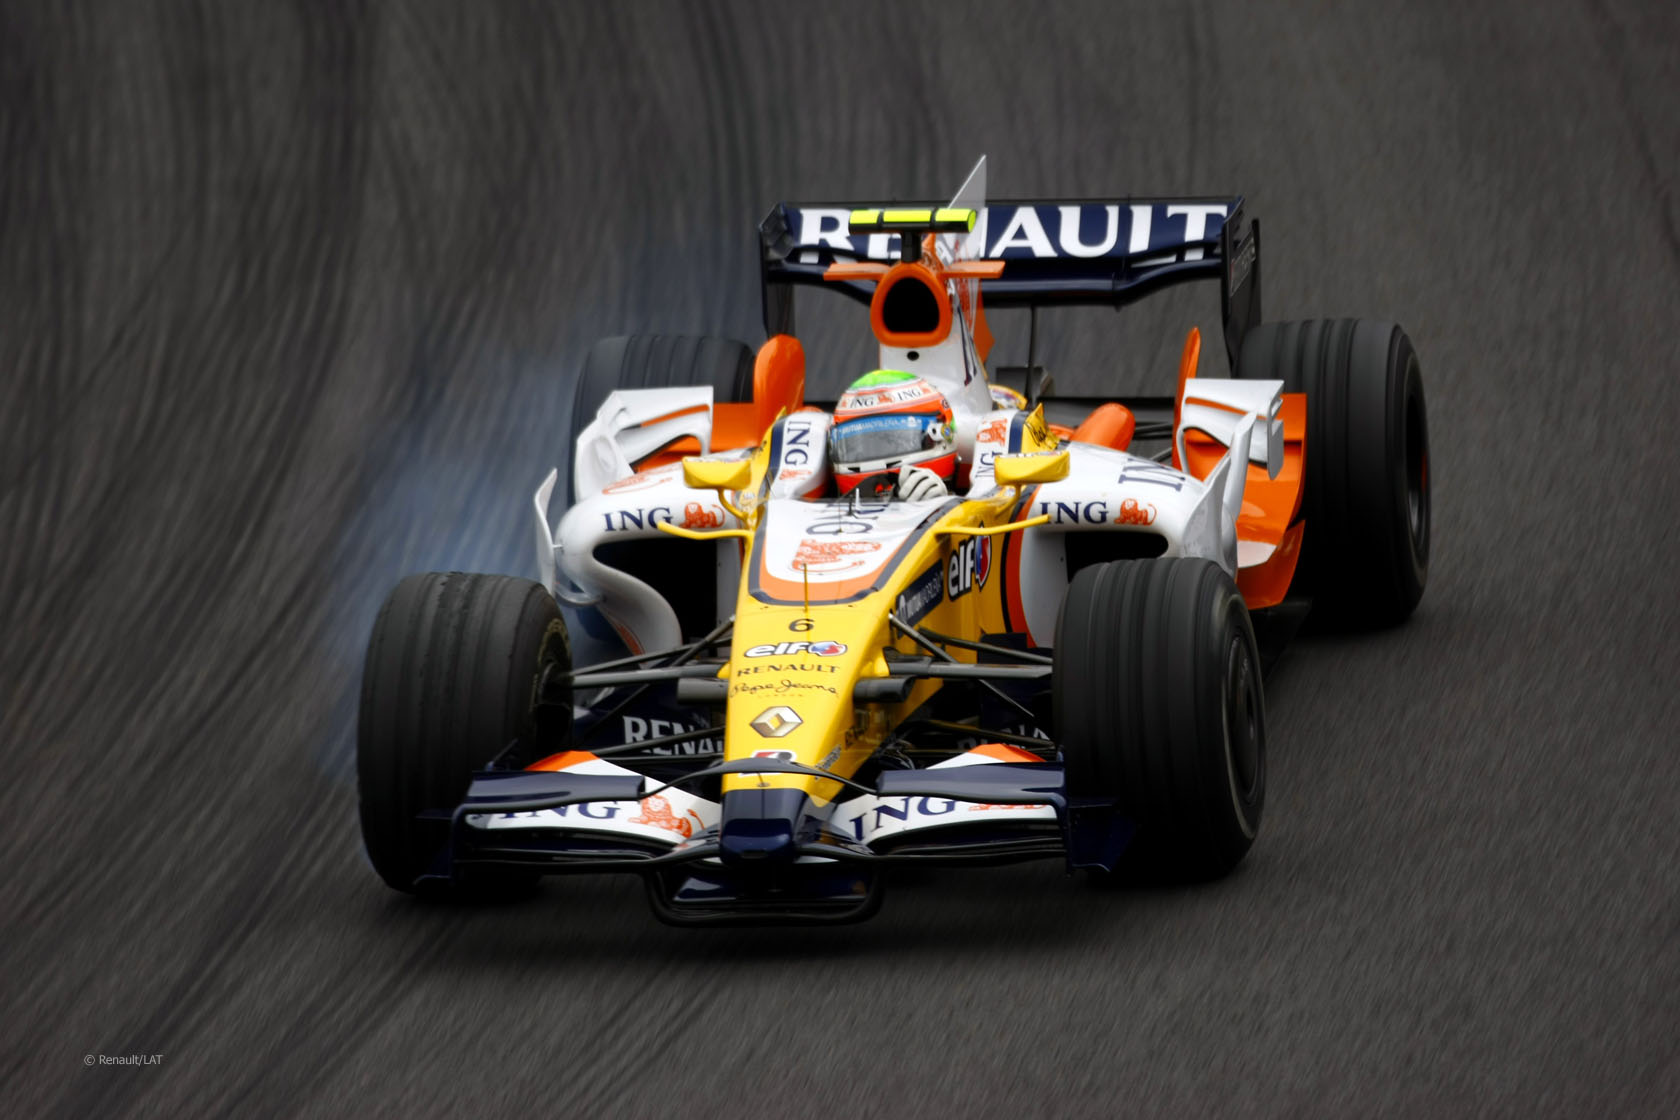 Nelson Piquet Jnr, Renault R28, Interlagos, 2008